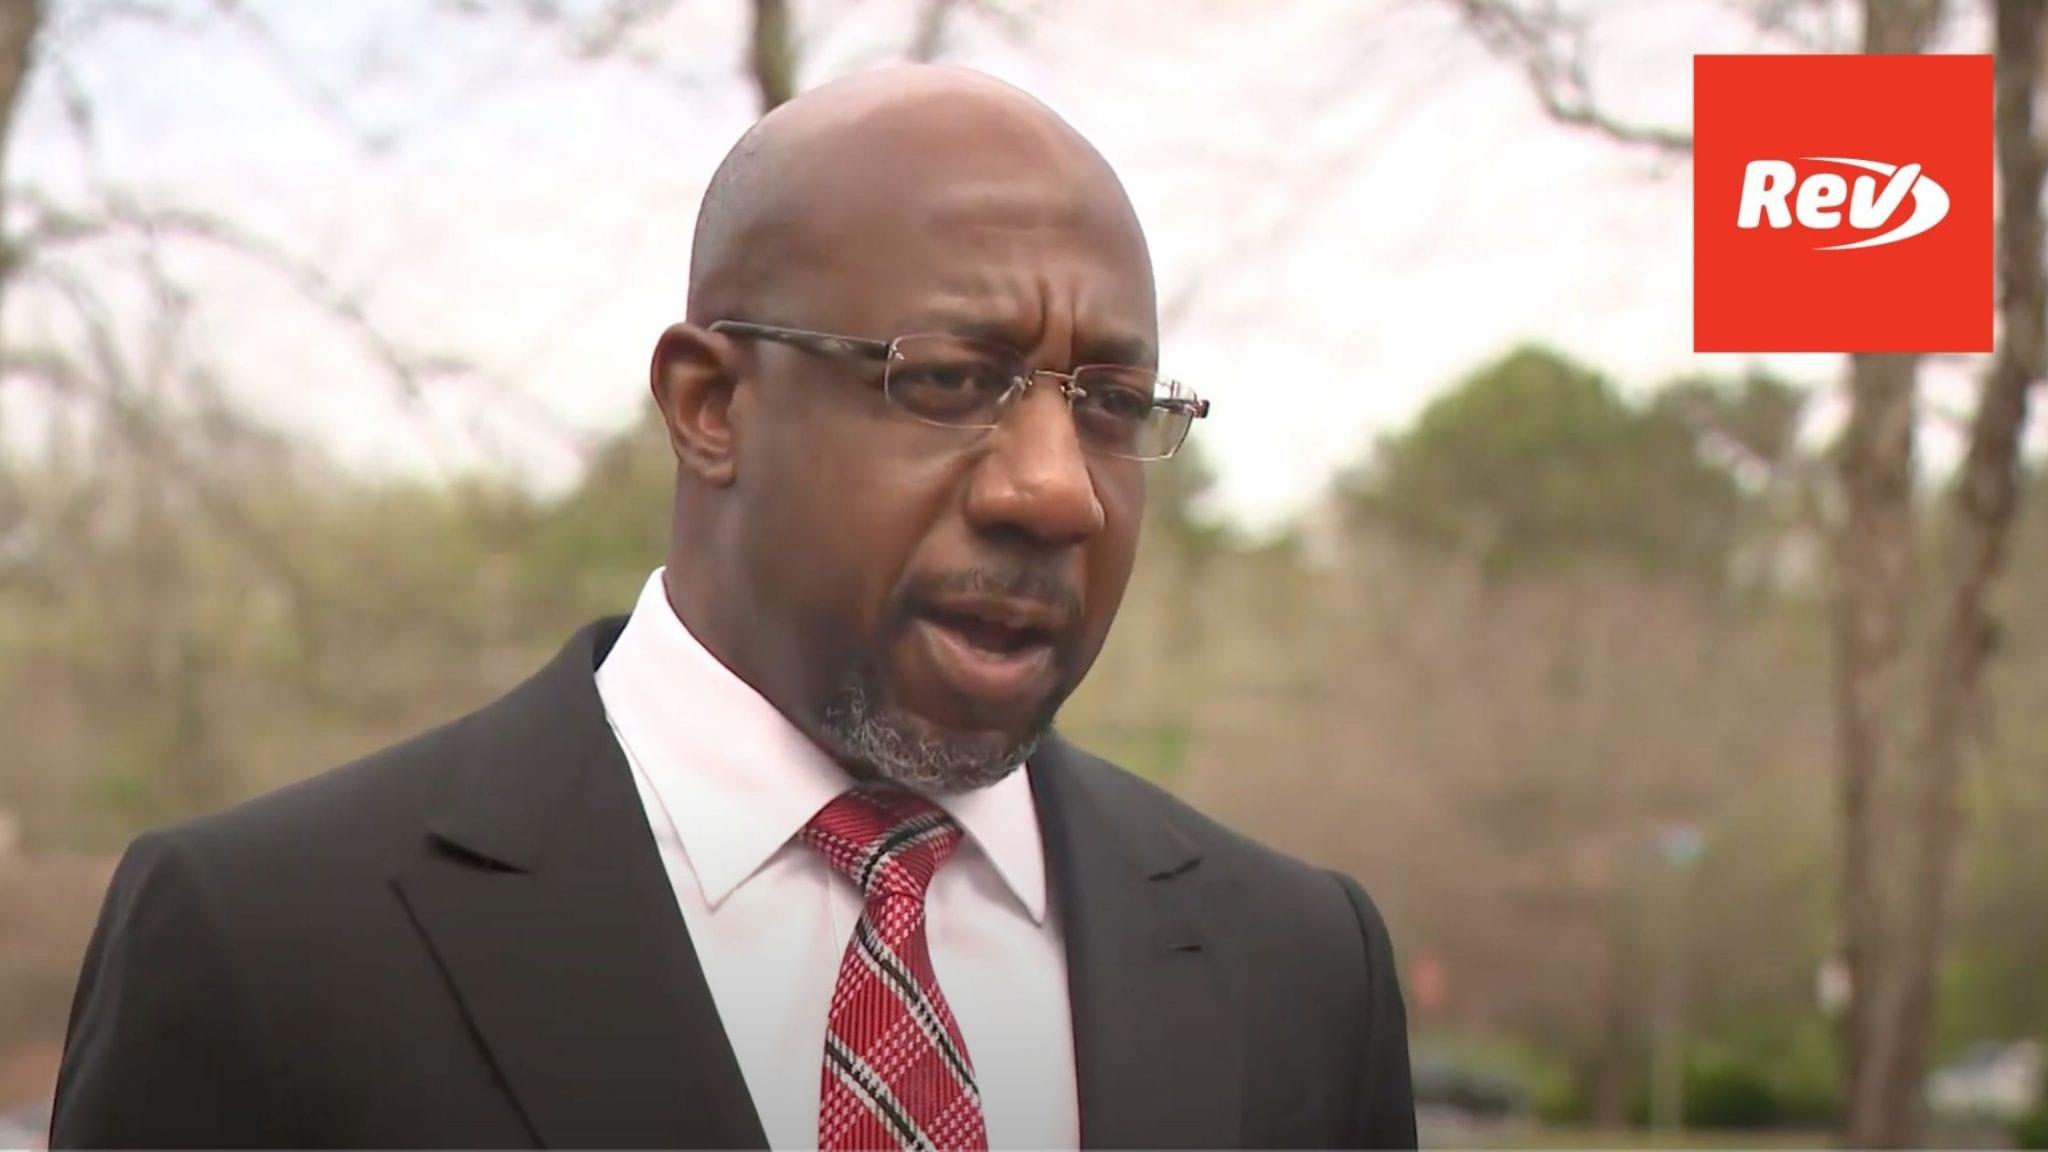 Senator Raphael Warnock Press Conference on New Georgia Voting Law Transcript March 26